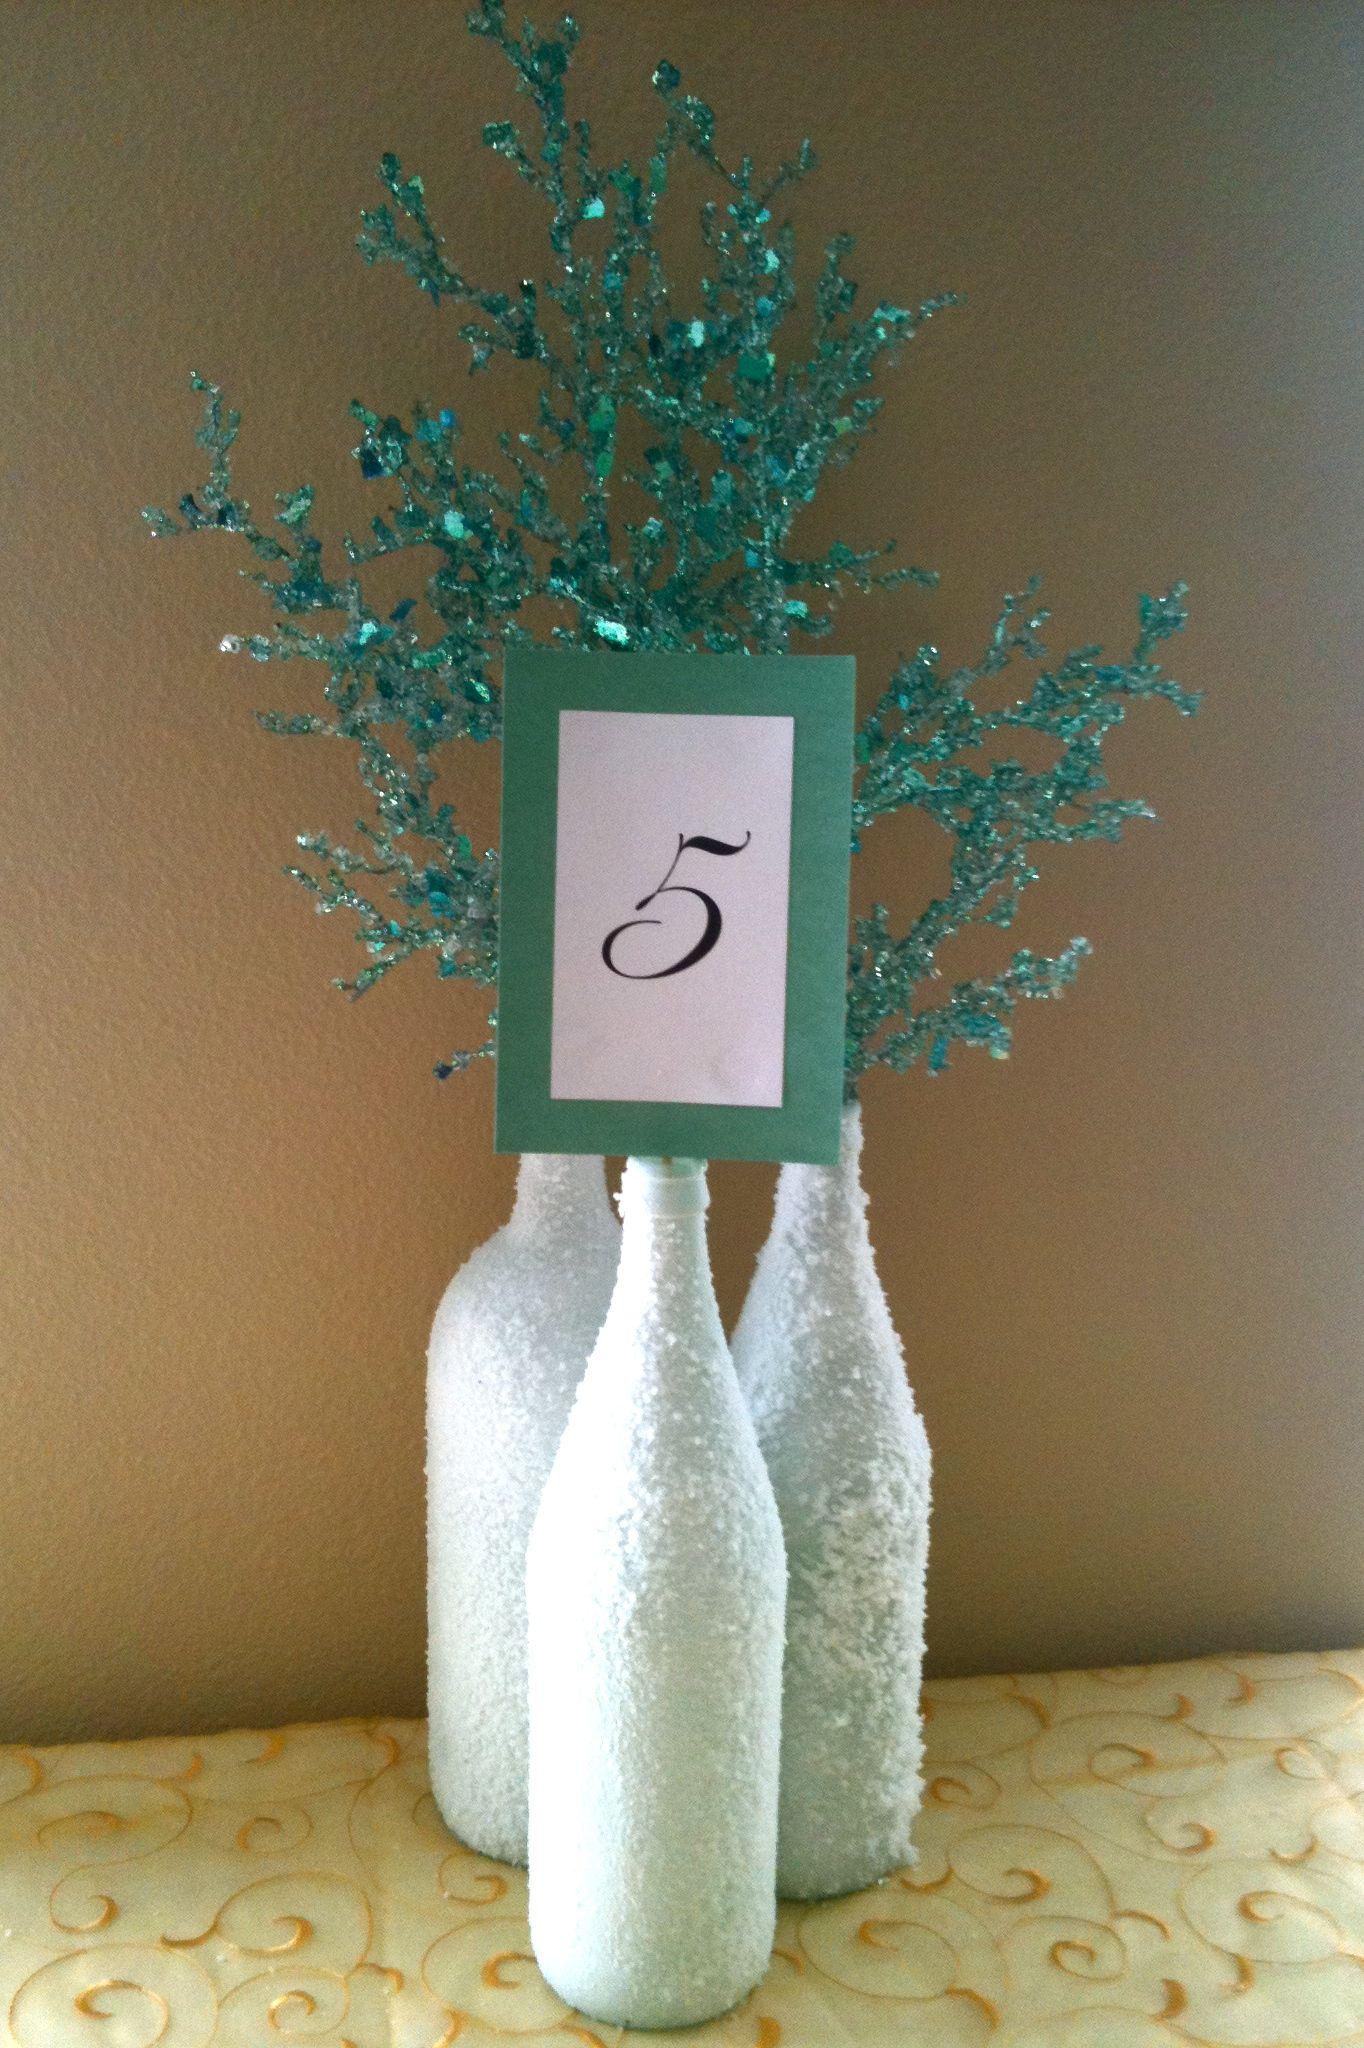 Winter Wedding Centerpiece Ideas Diy : Diy winter inspired wedding centerpieces ideas